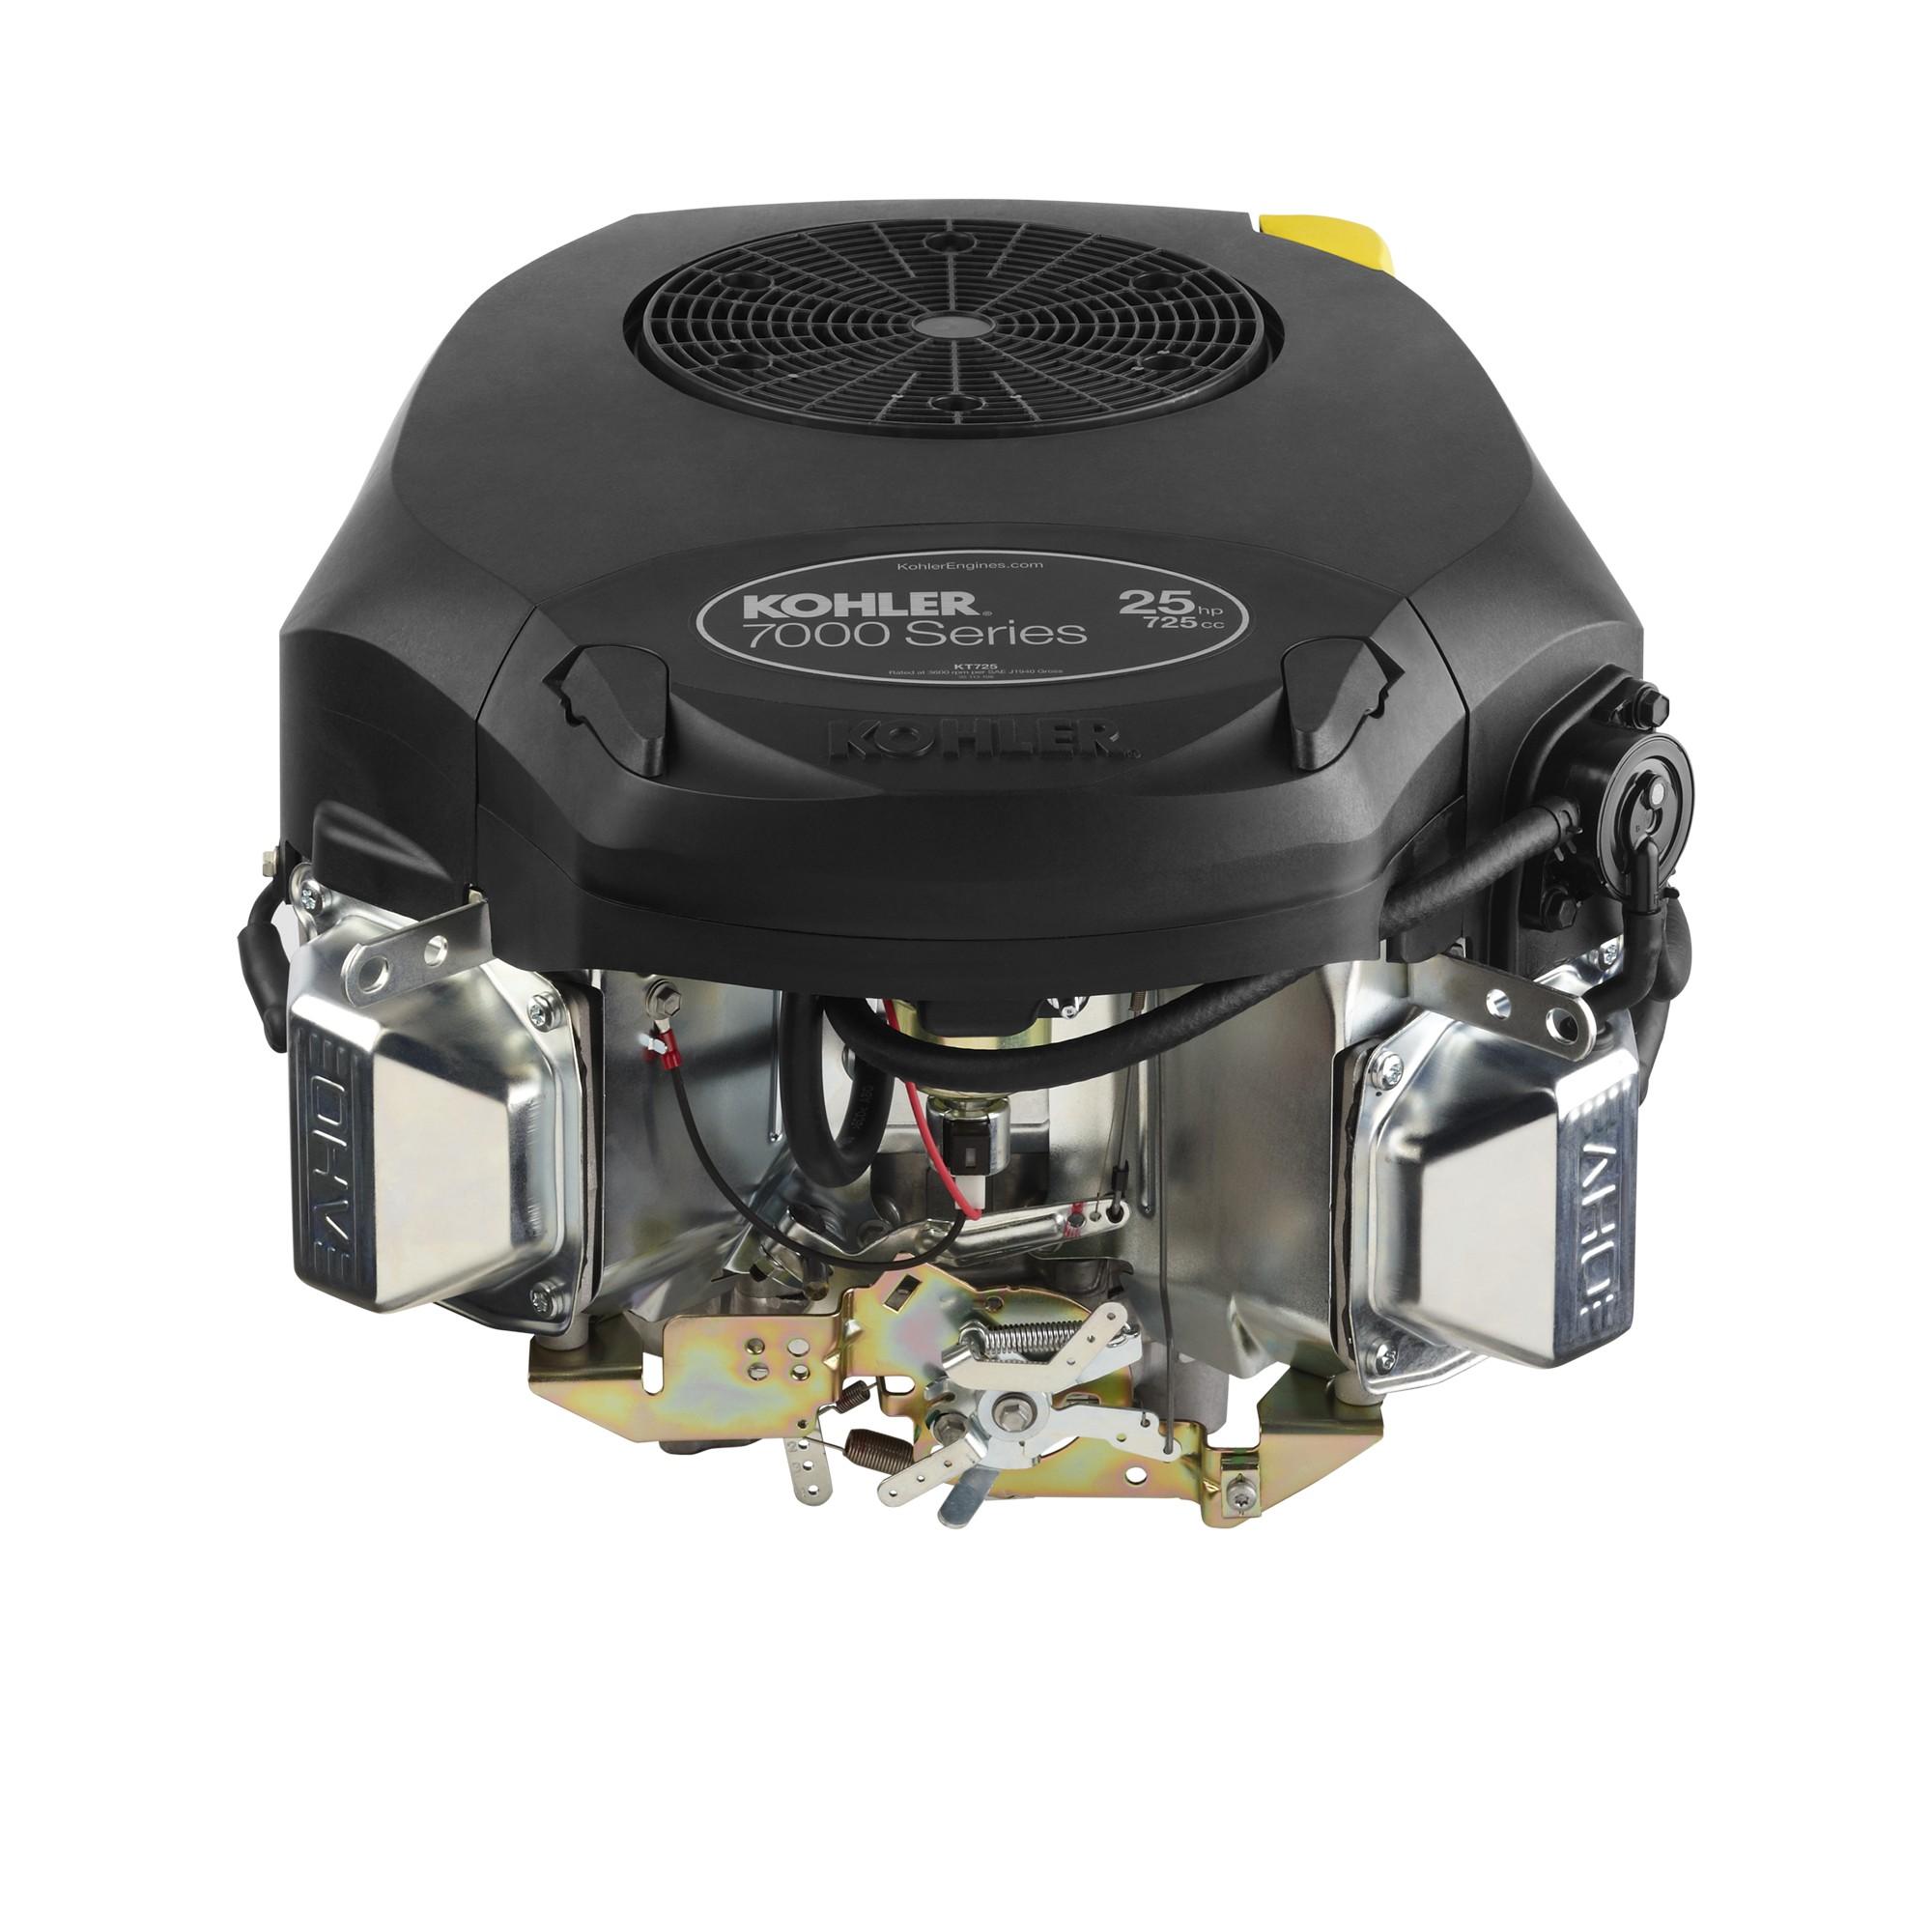 small resolution of kohler engines kt735 7000 series product detail engines kohler marine generator wiring diagram kohler 7000 generator wiring diagram